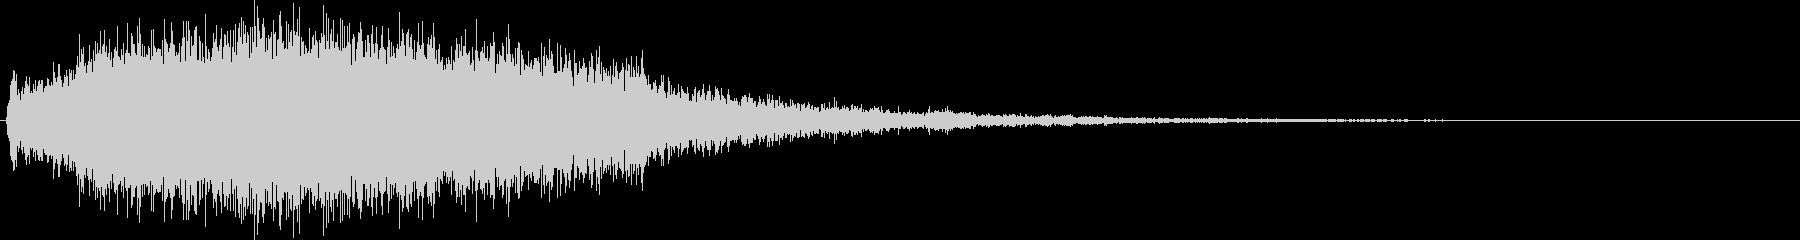 CINEMATIC BRAAMS_09の未再生の波形